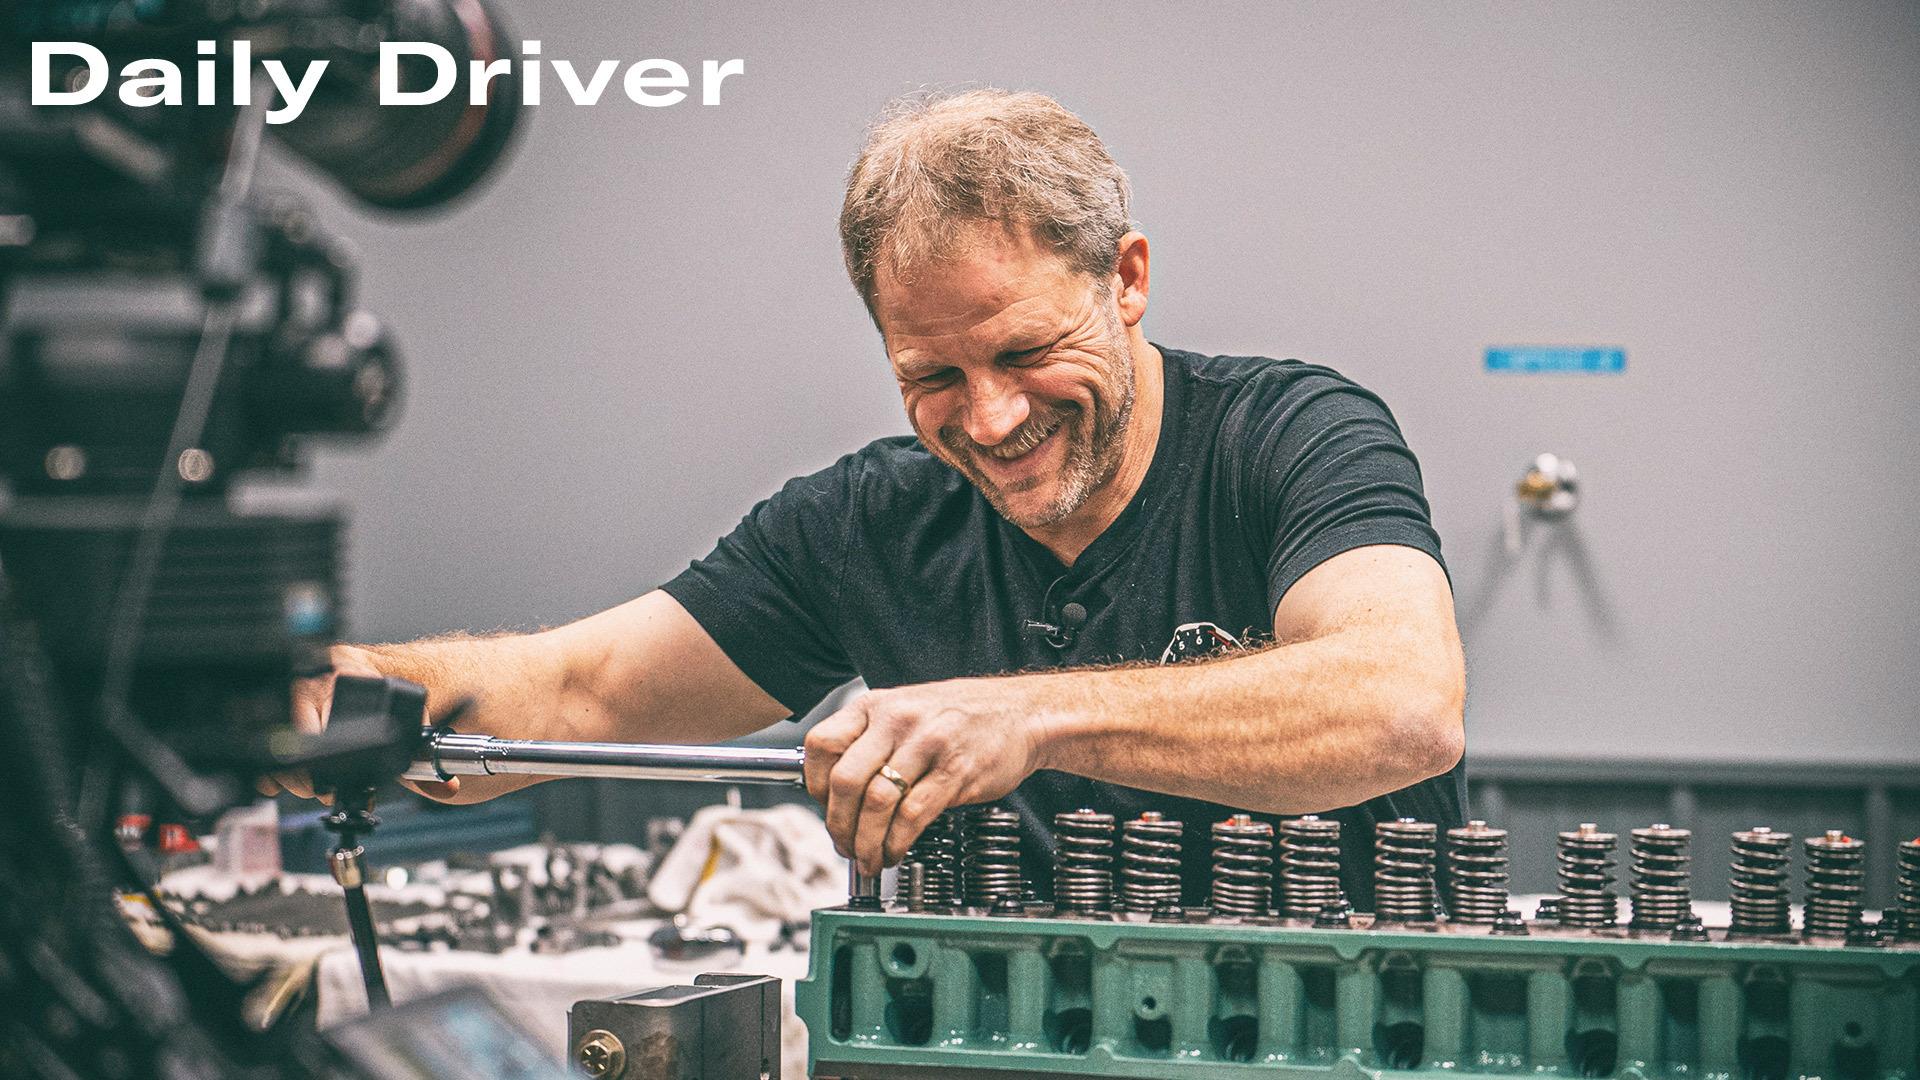 Daily Driver 107 Davin Reckow torque bolts